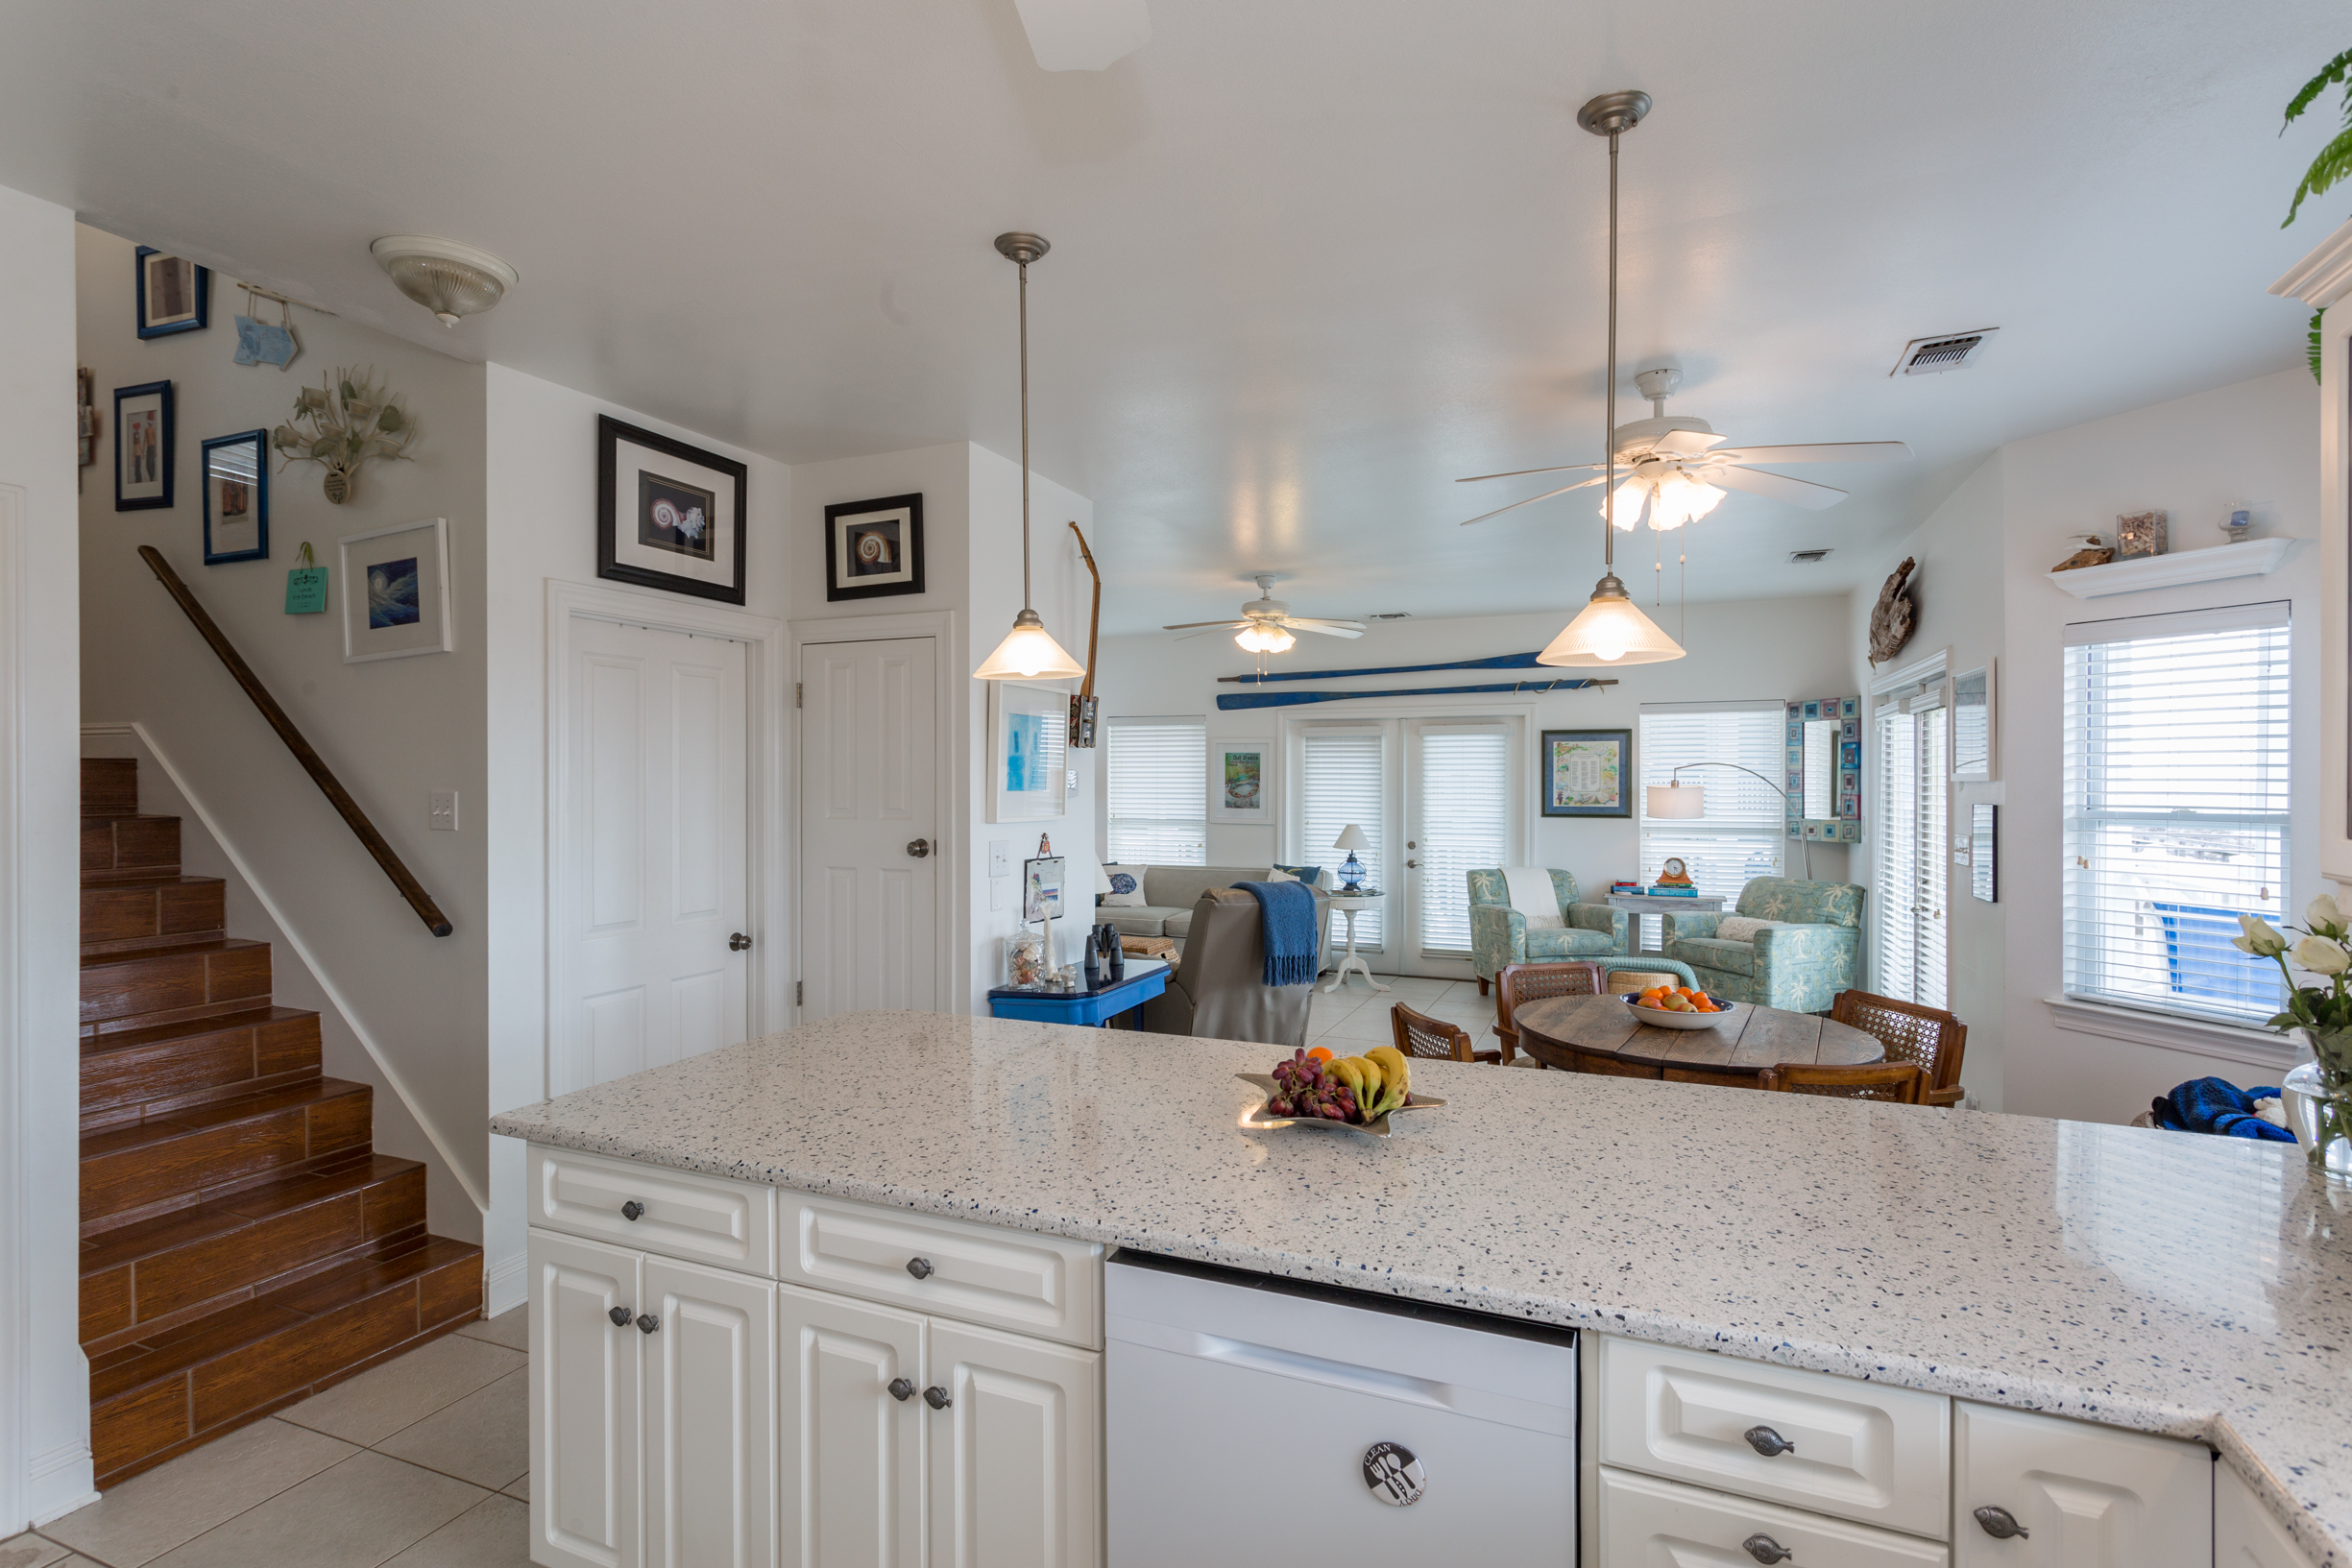 White Sands Cottage 501 Life's a Beach House Townhouse rental in White Sands Pensacola Beach in Pensacola Beach Florida - #10